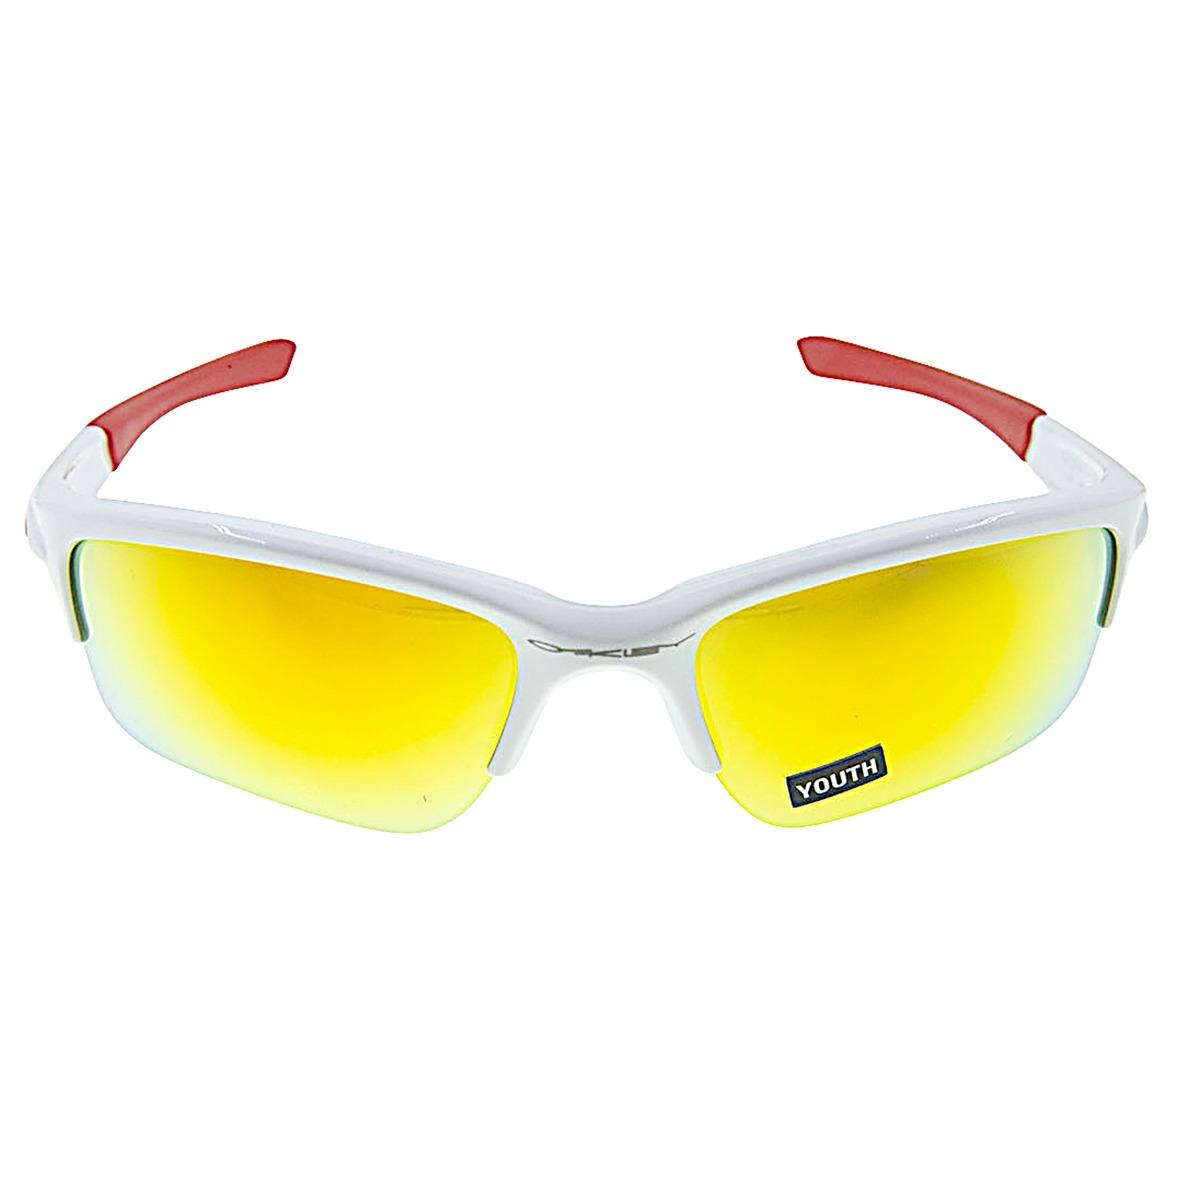 3c65a66c75b Details about New Authentic Oakley Quarter Jacket Youth Sunglasses 920003